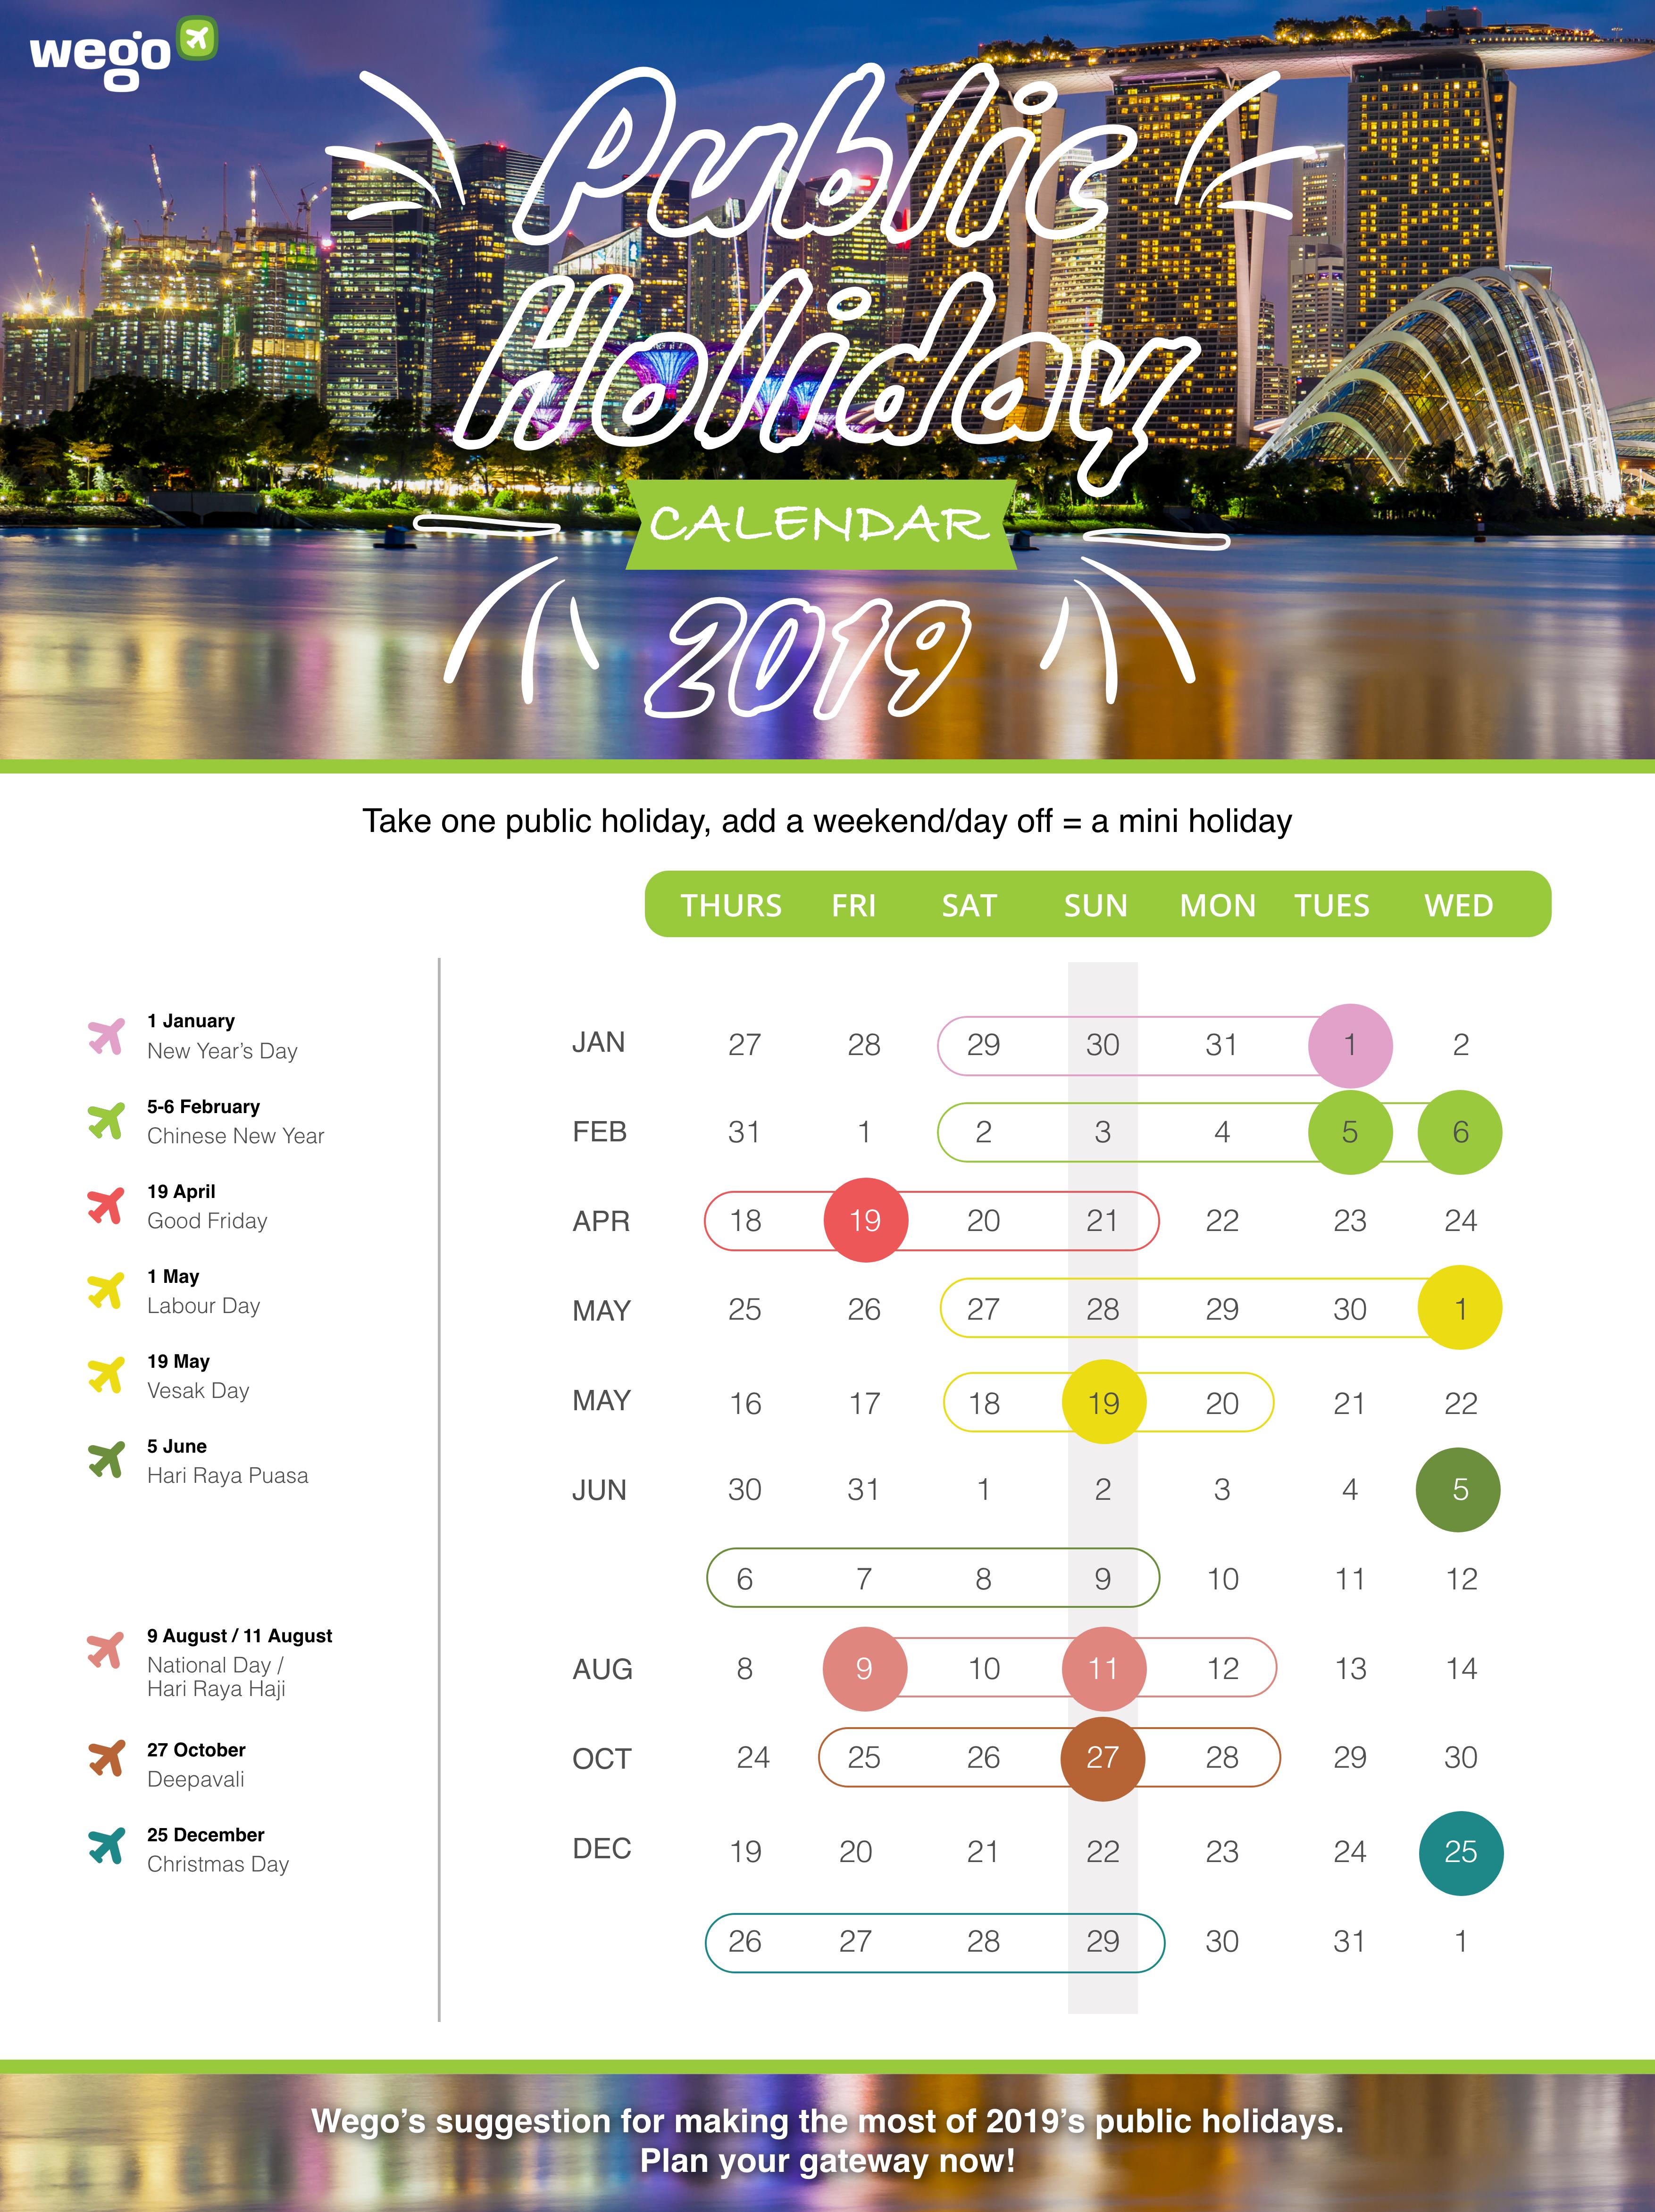 Wego\'s 2019 Calendar for Public Holidays in Singapore.